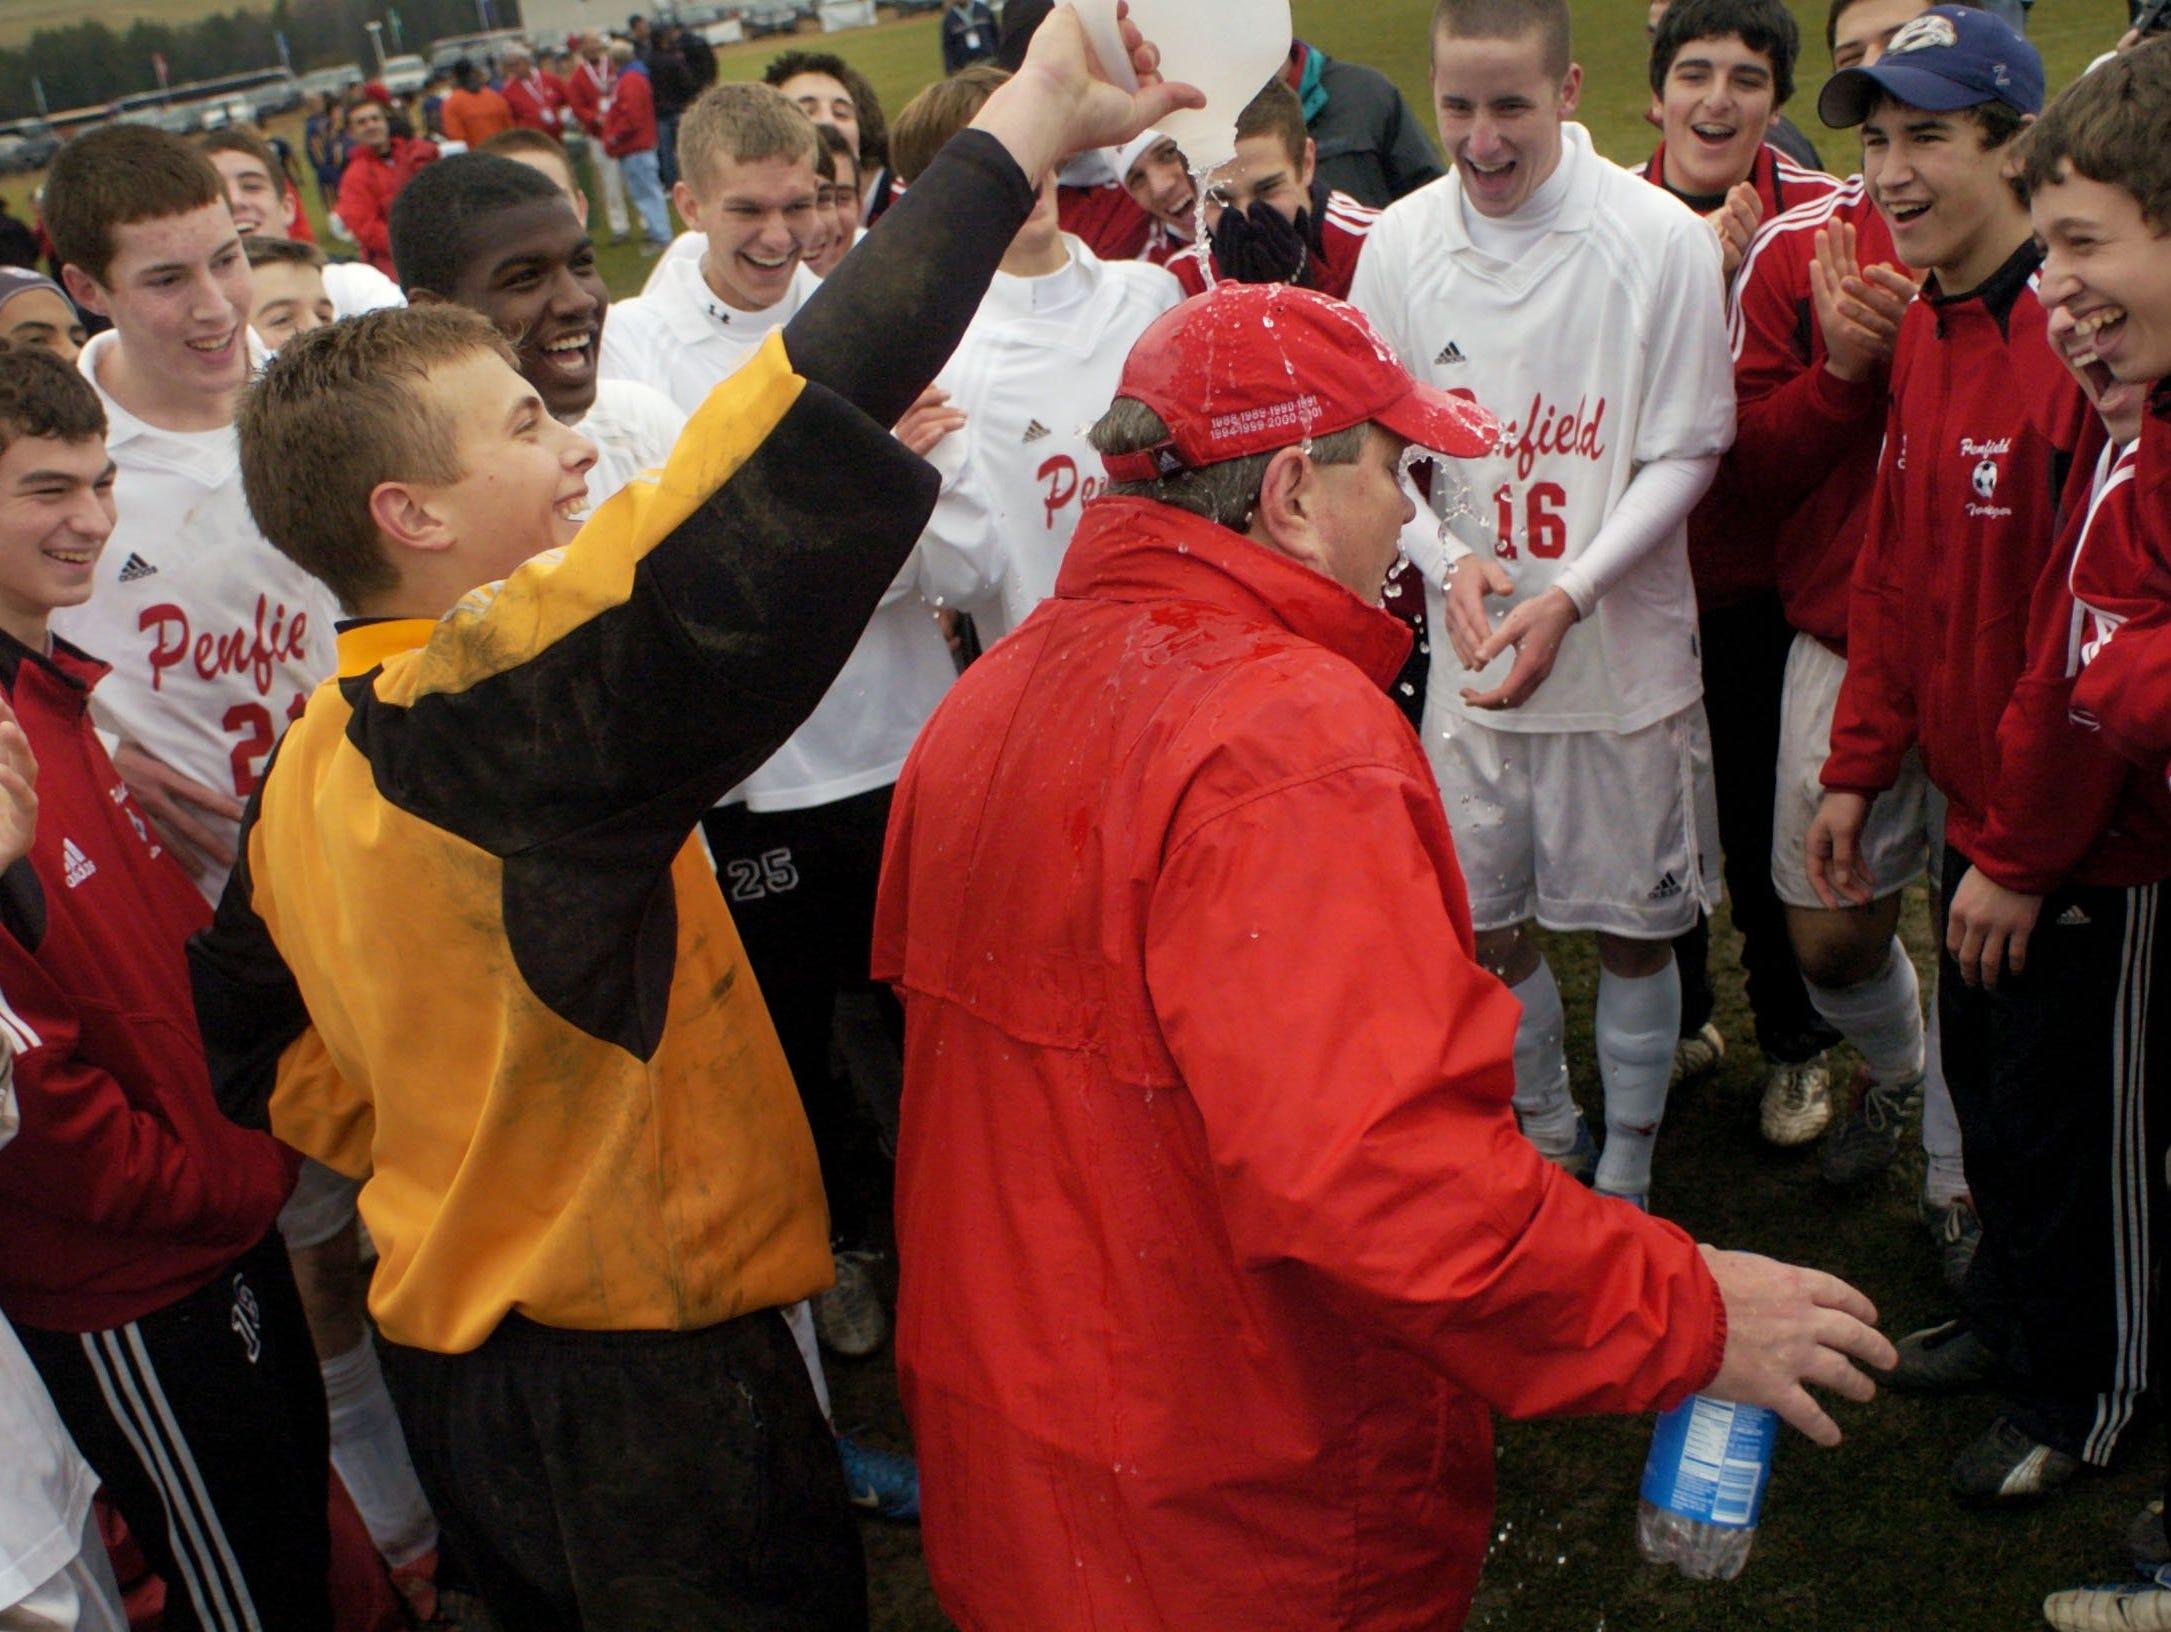 Former Penfield's goal keeper Kyle Zinter dumps a gallon of water on head coach John Butterworth after beating Massapequa in the 2004 State Class AA Boys Soccer Championship.